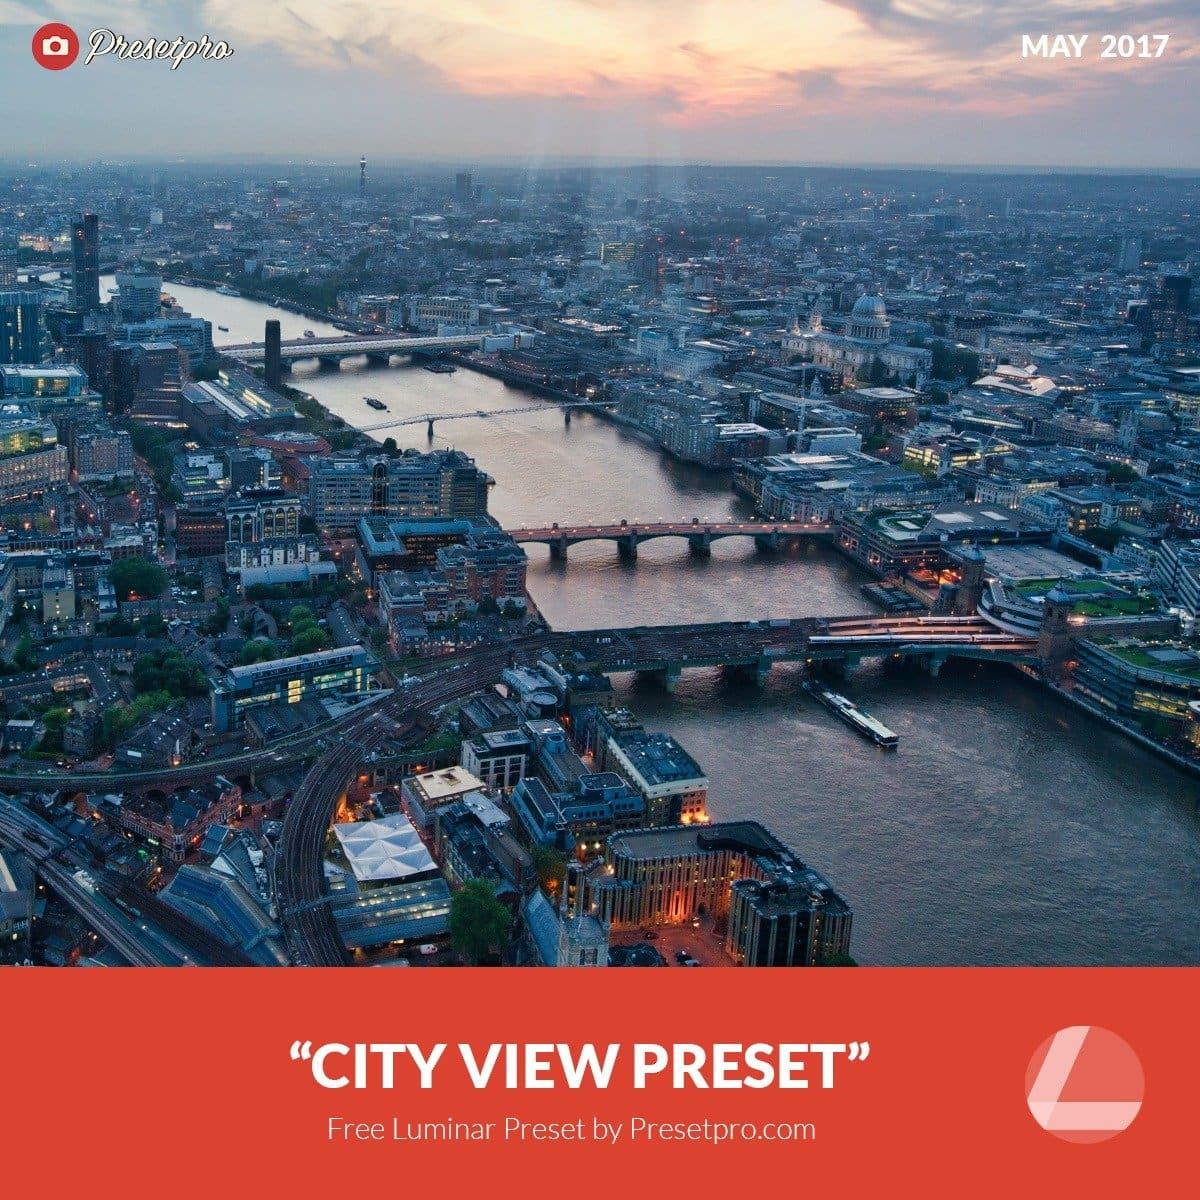 Free-Luminar-Preset-City-View-Presetpro.com